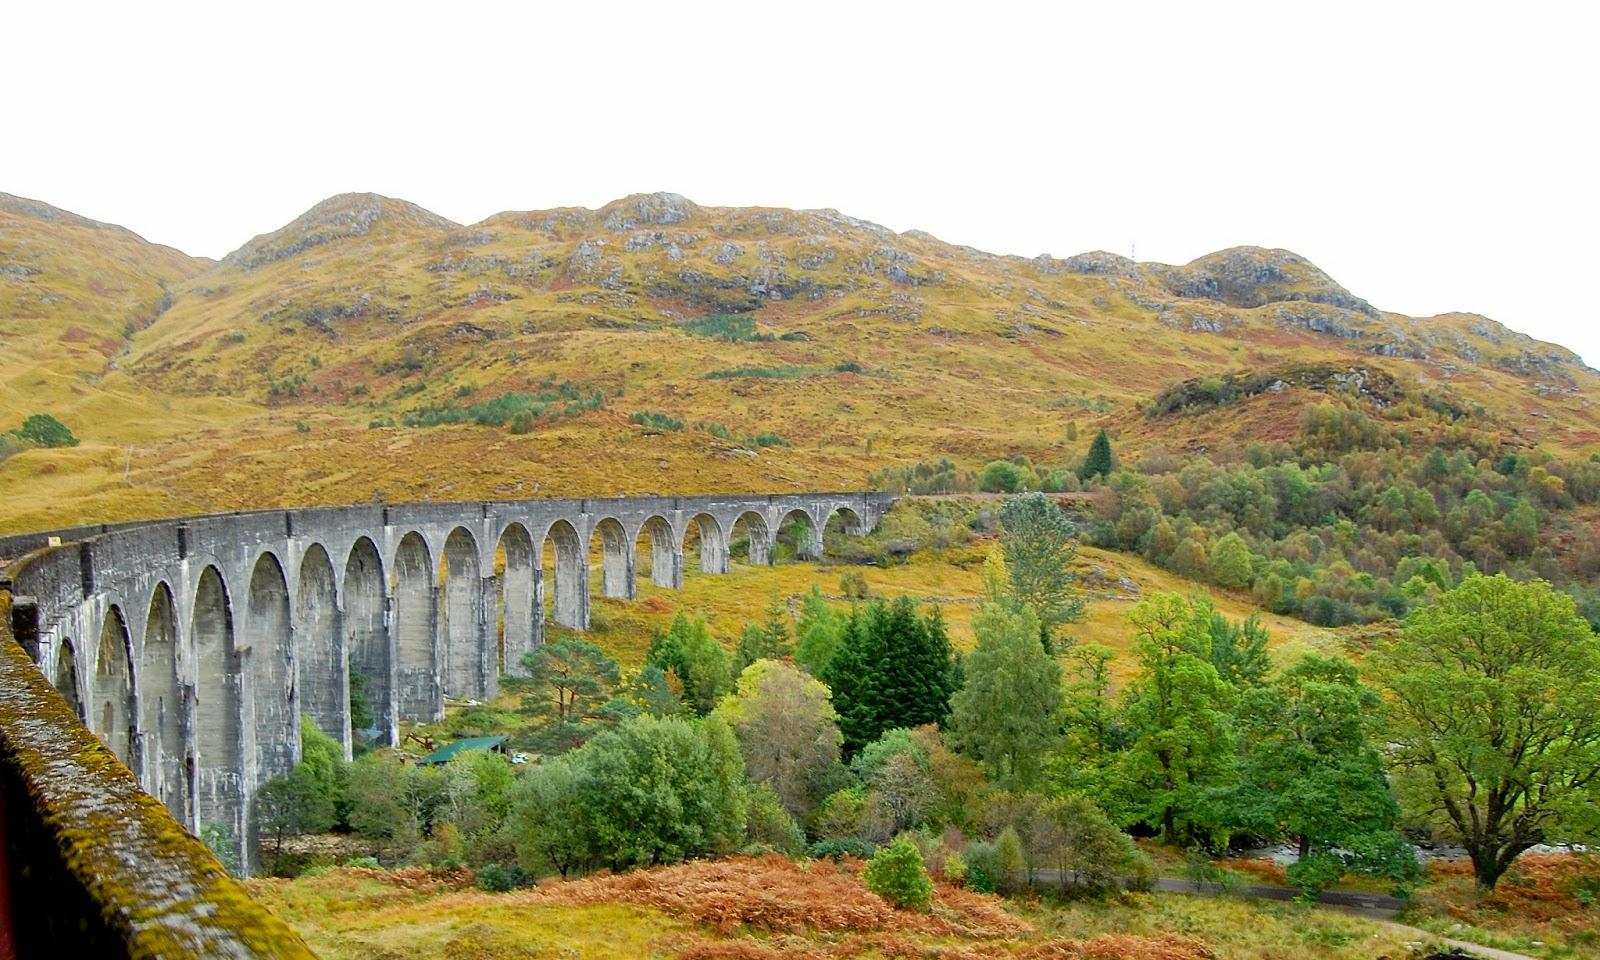 Leaving the Glenfinnan Viaduct